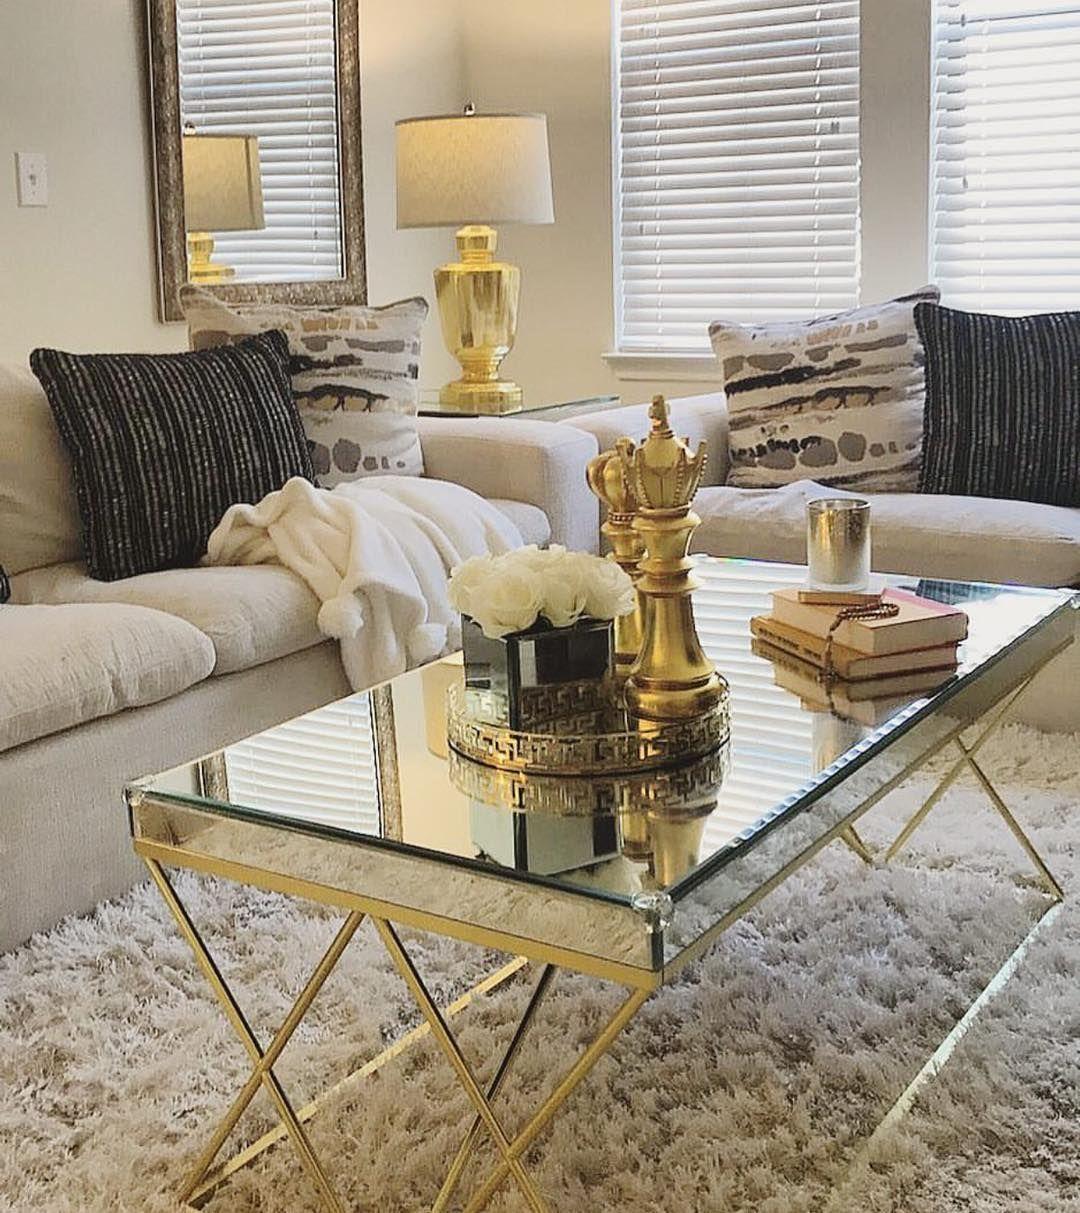 Stunning 12 Beegcom Top Interior Design Colleges In Jaipur Trending Decor Home Decor Trends Home Decor Online